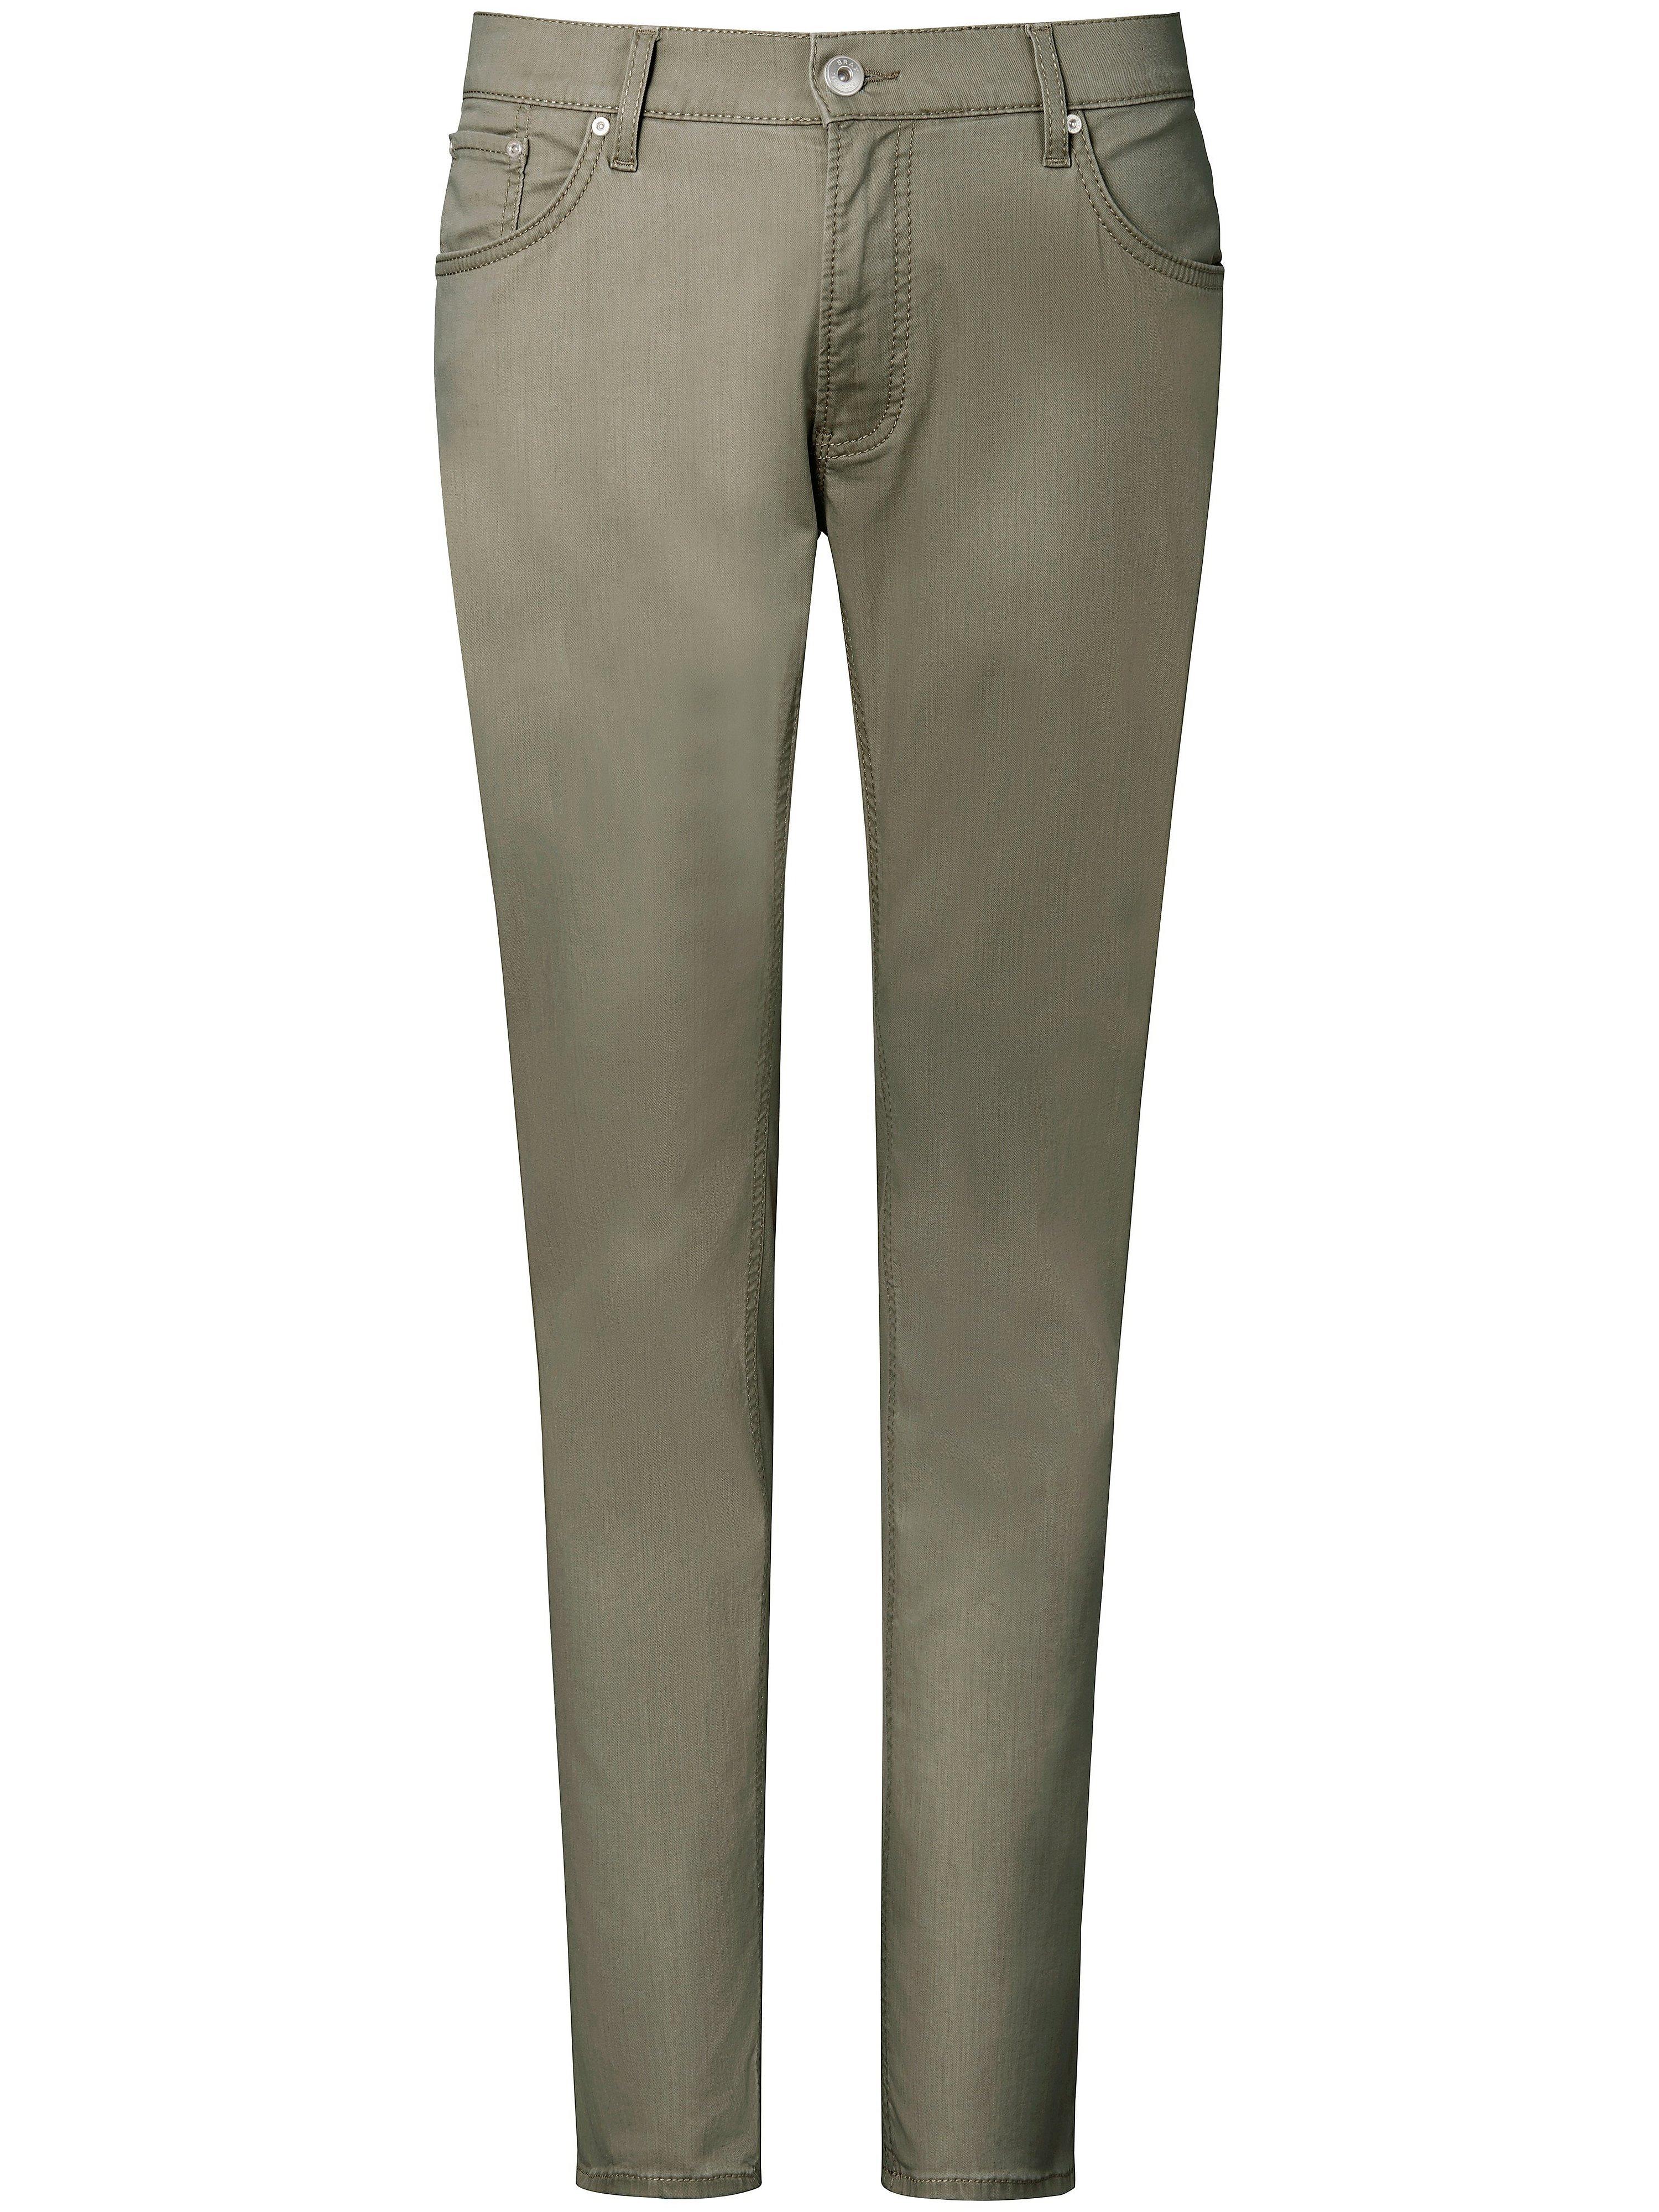 Jeans design Cadiz Brax Feel Good green